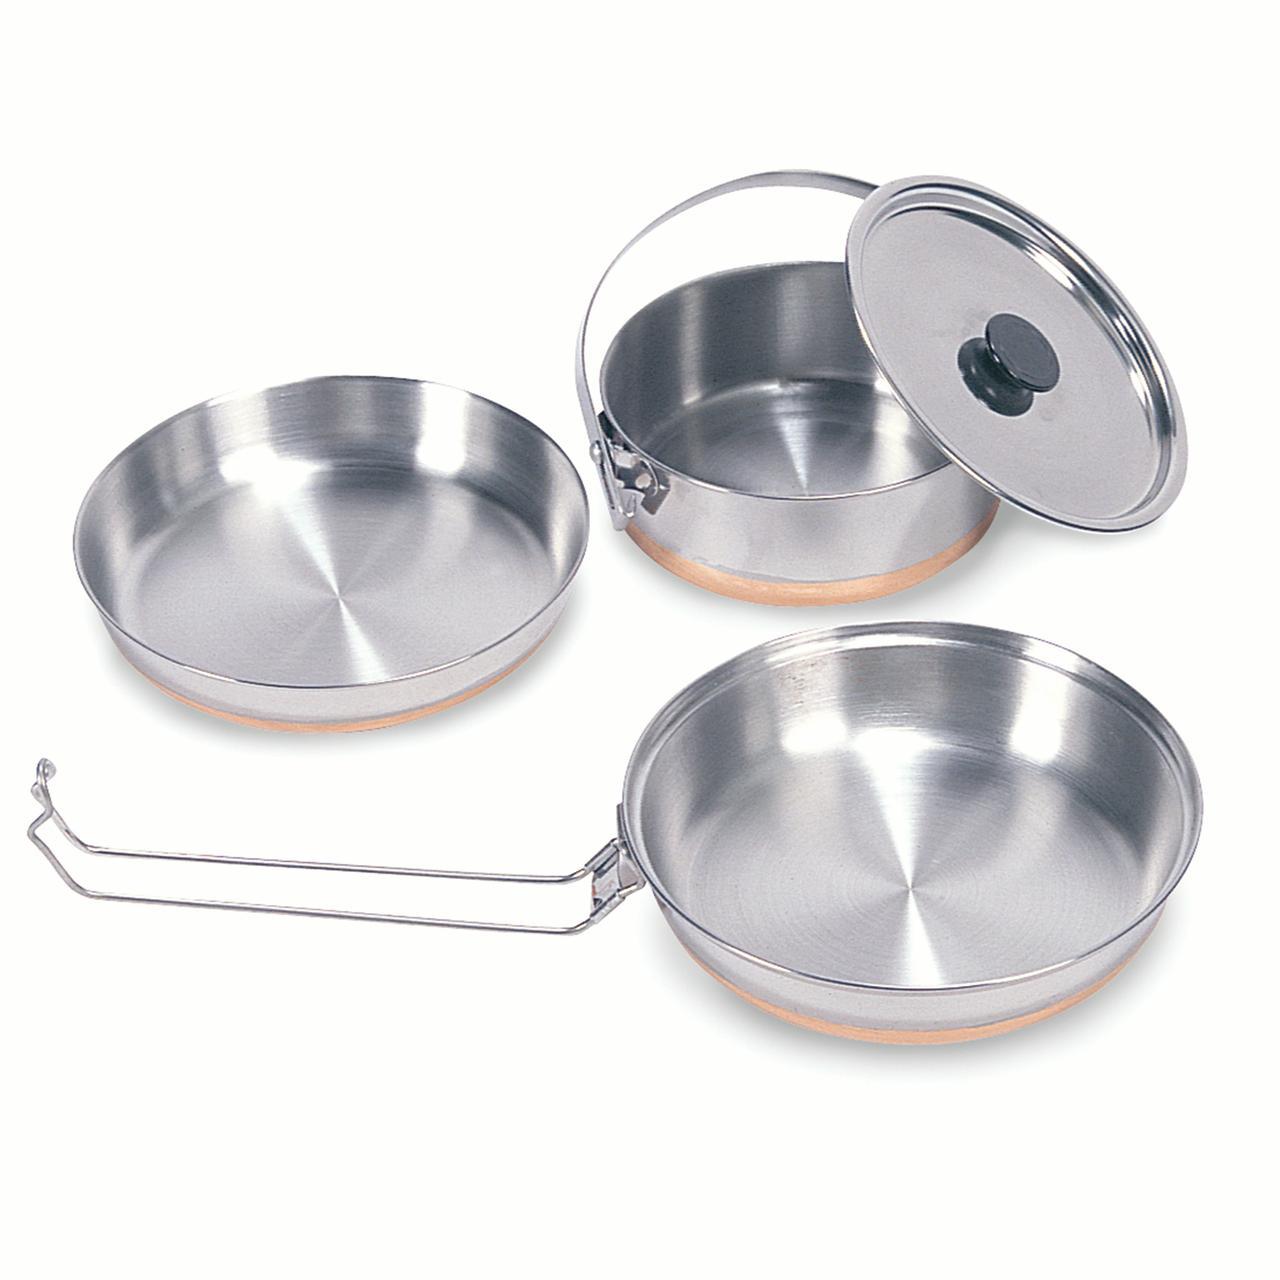 Stansport Stainless Steel Mess Kit - 1 Pan, 1 Saucepan, 1 Plate